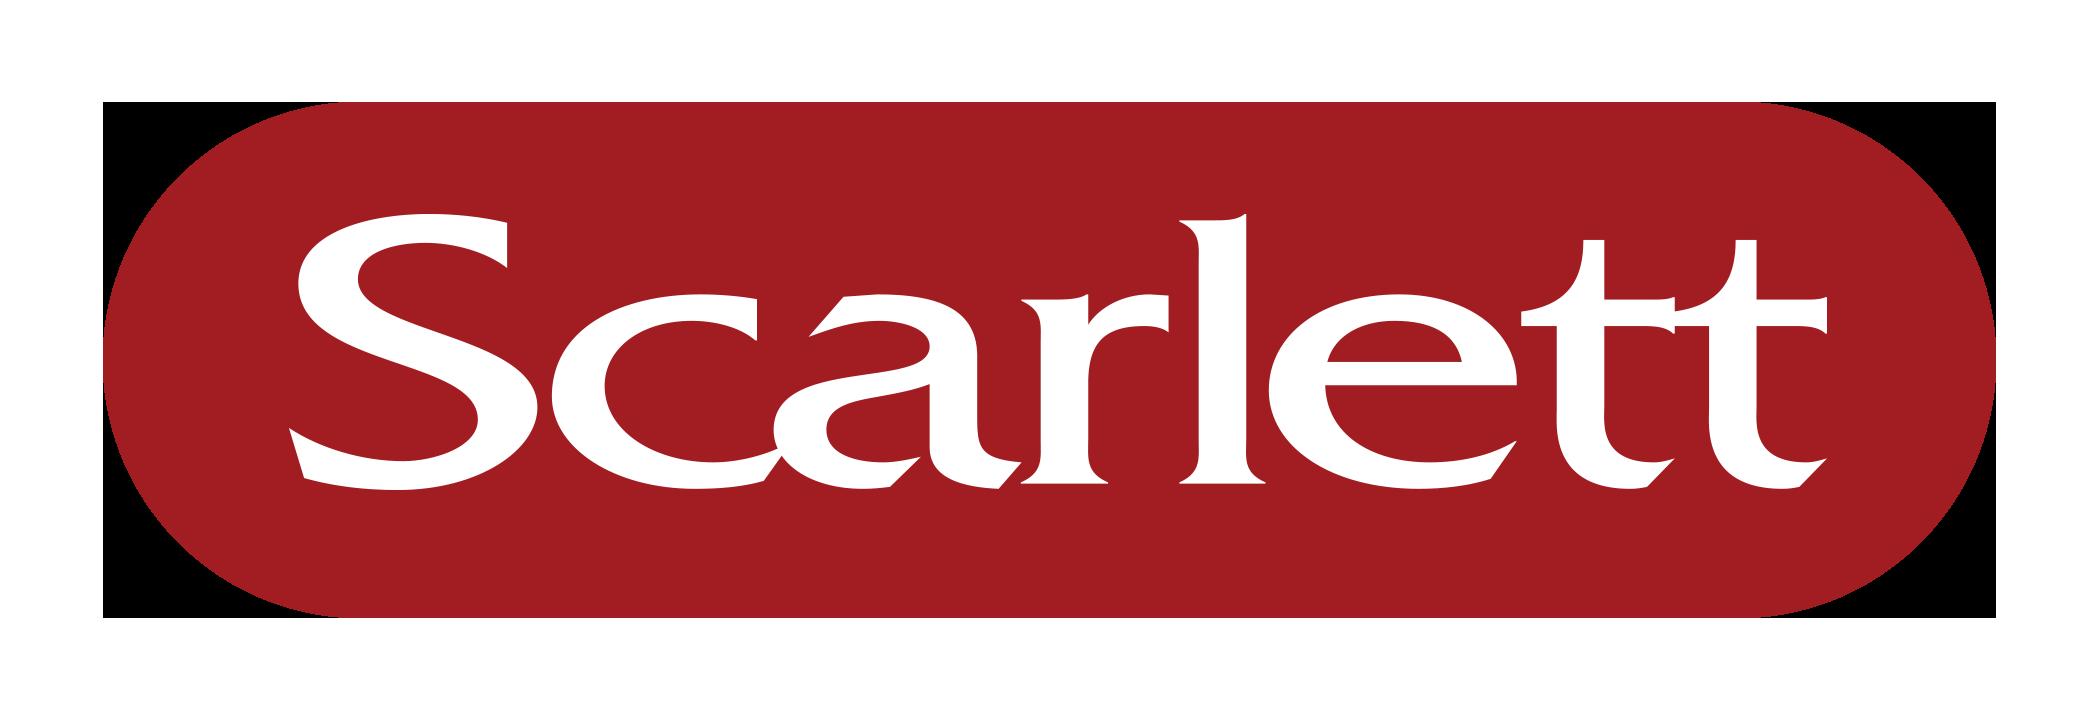 Scarlett Inc.